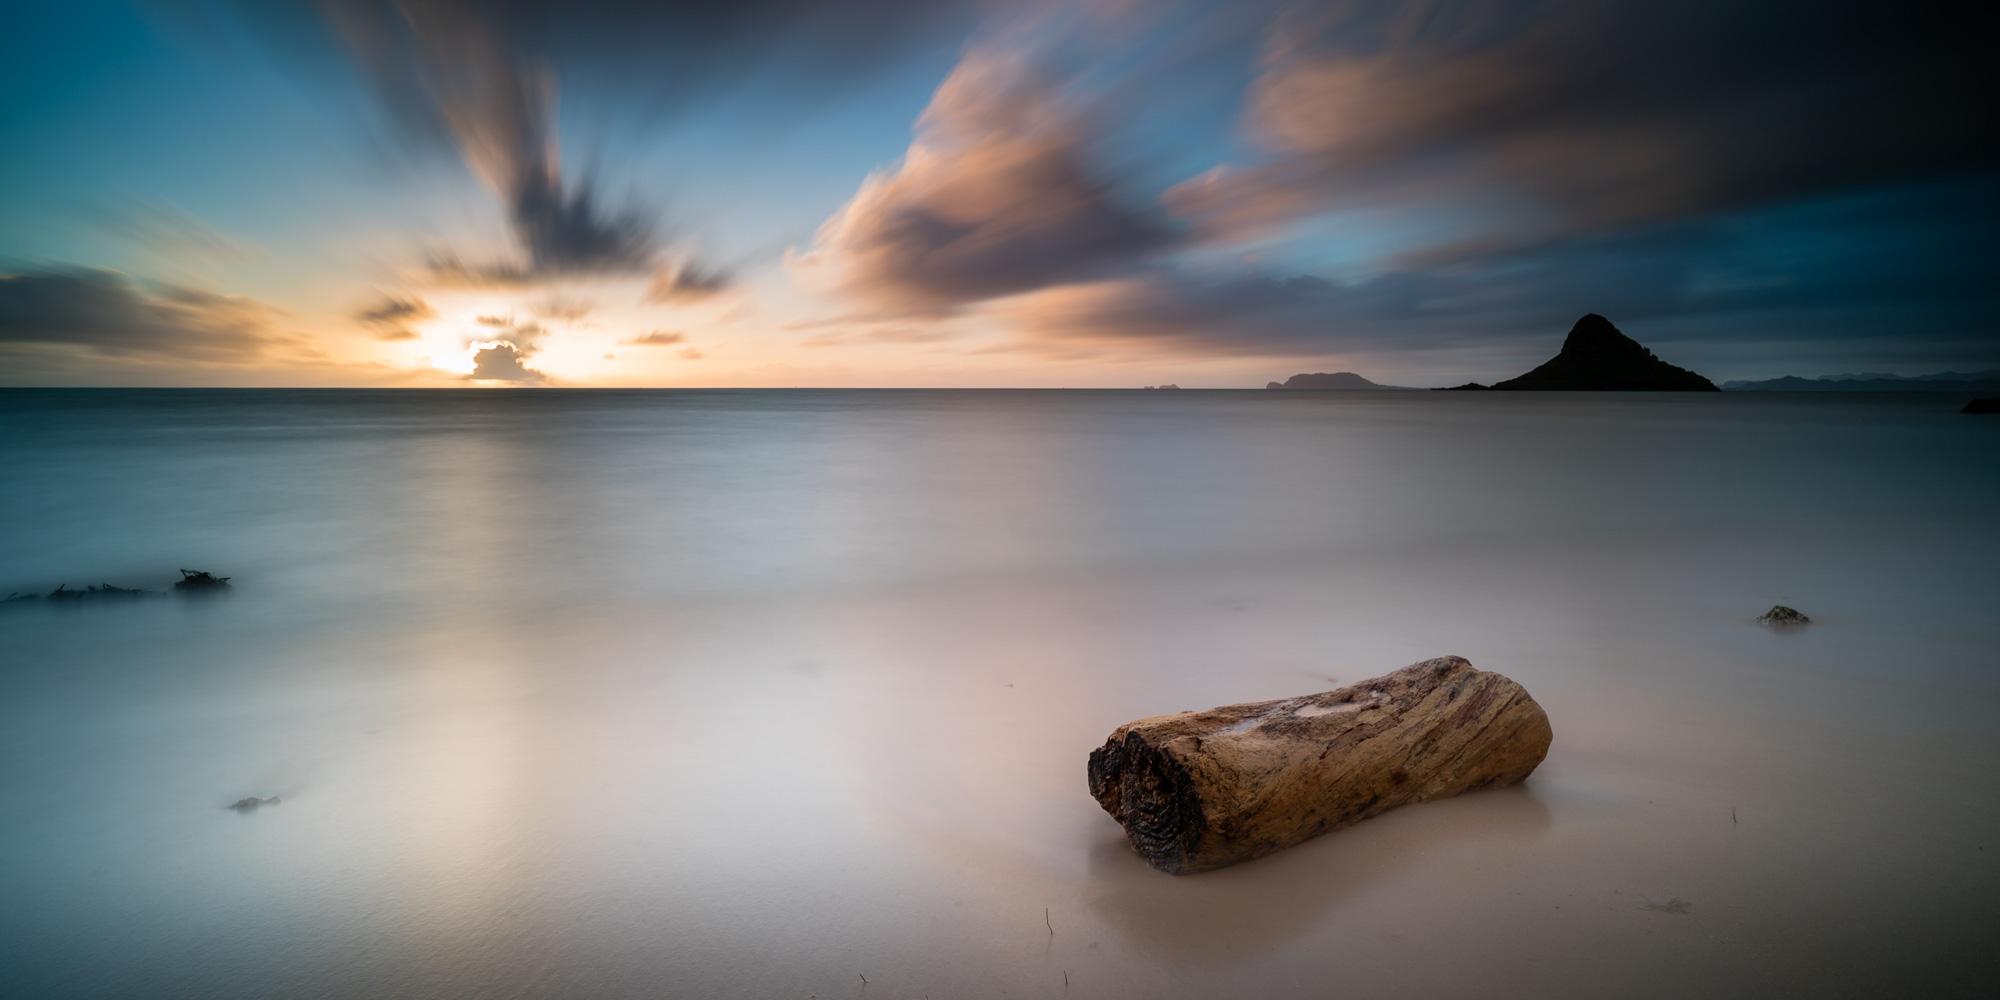 Kualoa Beach Park Lee Filter Big Stopper & 3 stop medium grad Sony A7S II |  181 sec. |  f/8  |  ISO 50  |  Zeiss Batis 18mm  Edited in Lightroom CC 2015  Copyright 2016 Ryan Sakamoto, All rights reserved